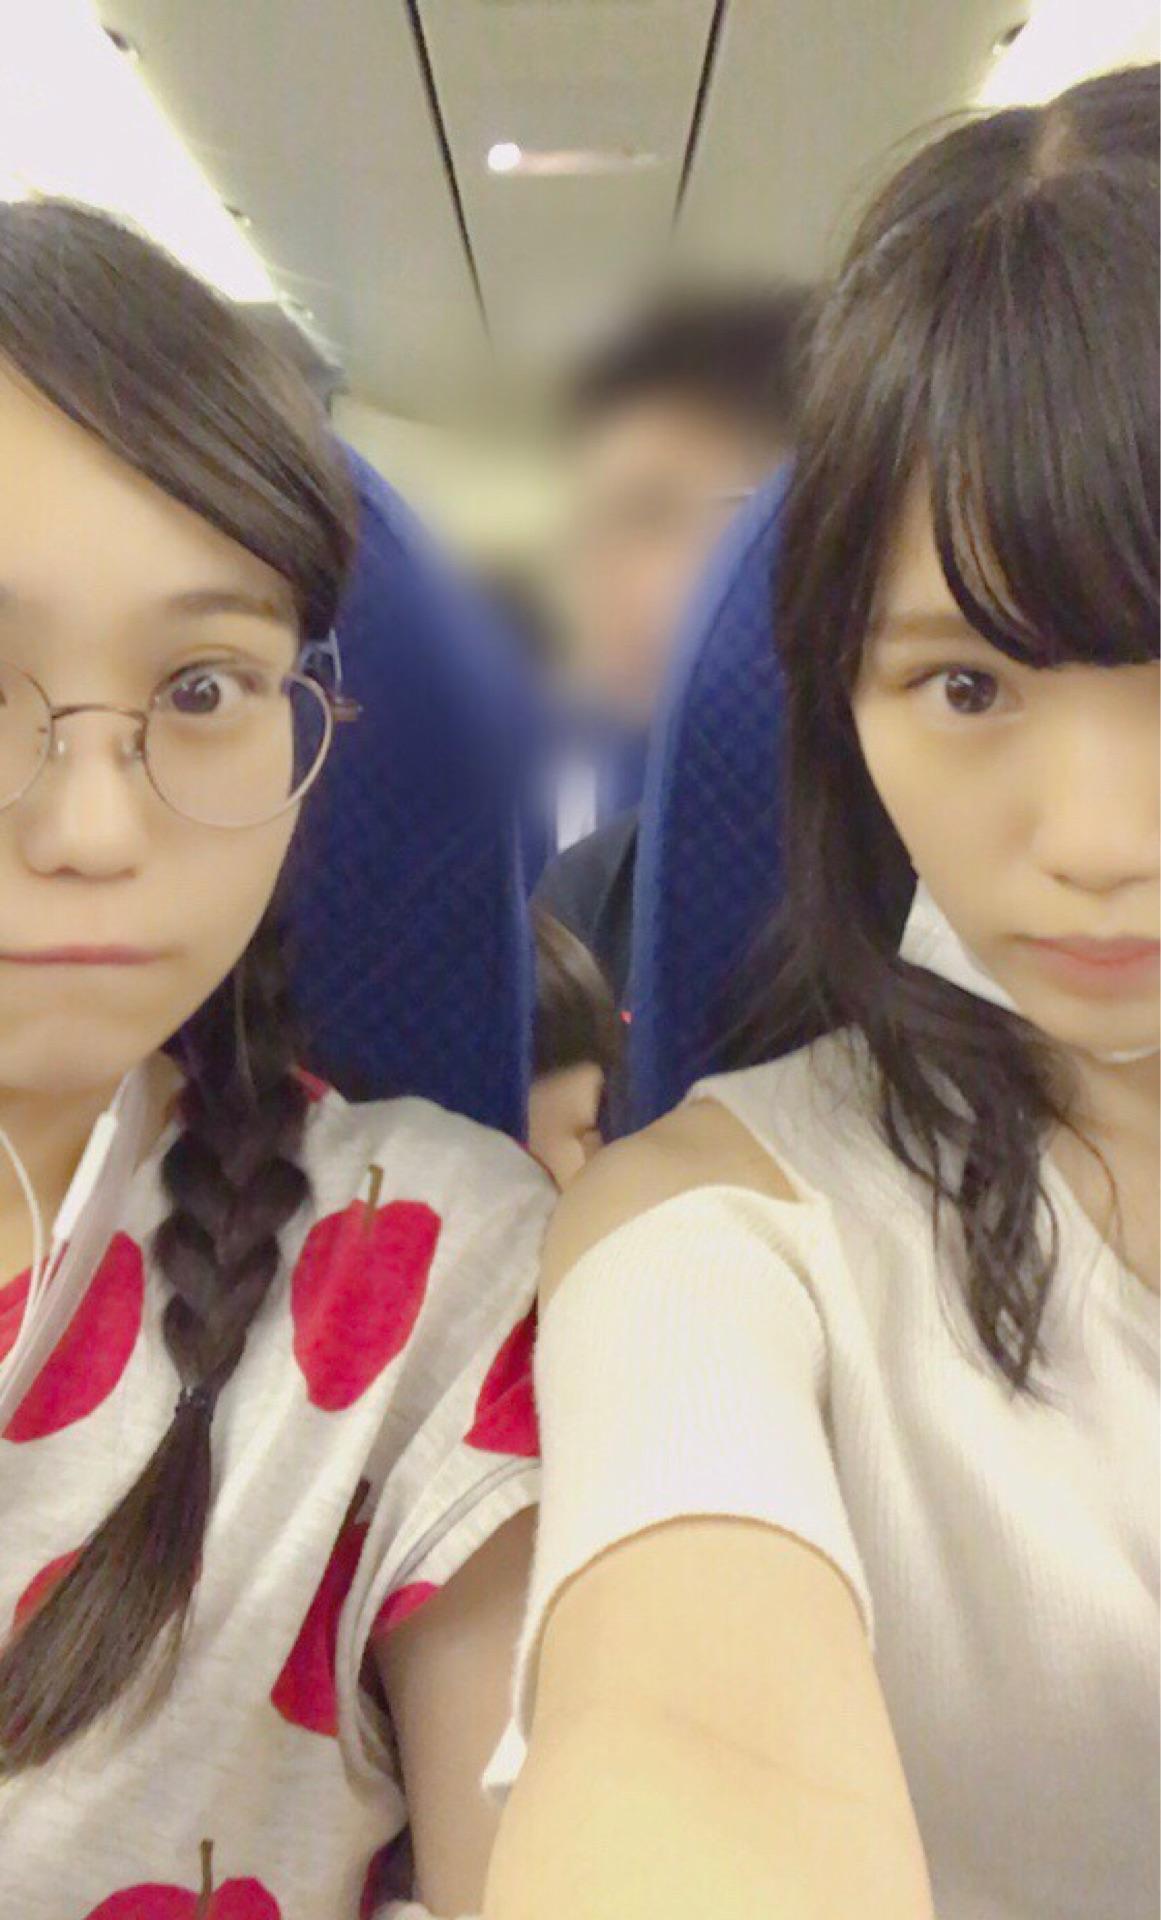 【HKT48】運上弘菜ちゃん応援スレ☆52【なっぴ/チームKIV】 YouTube動画>20本 ->画像>184枚